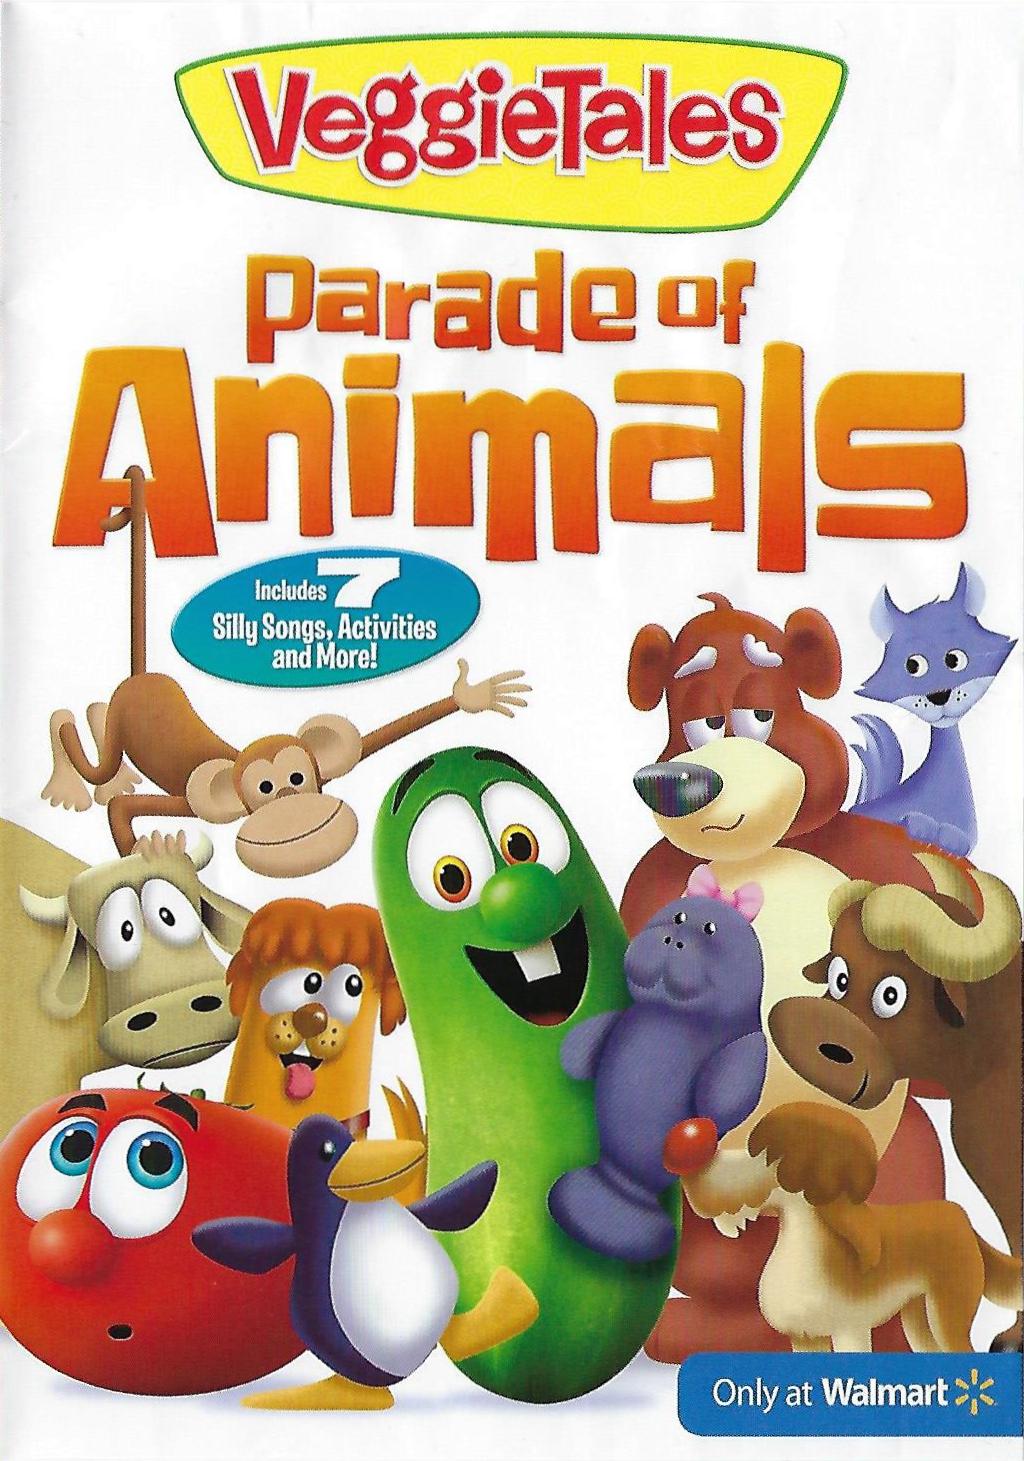 Parade of Animals